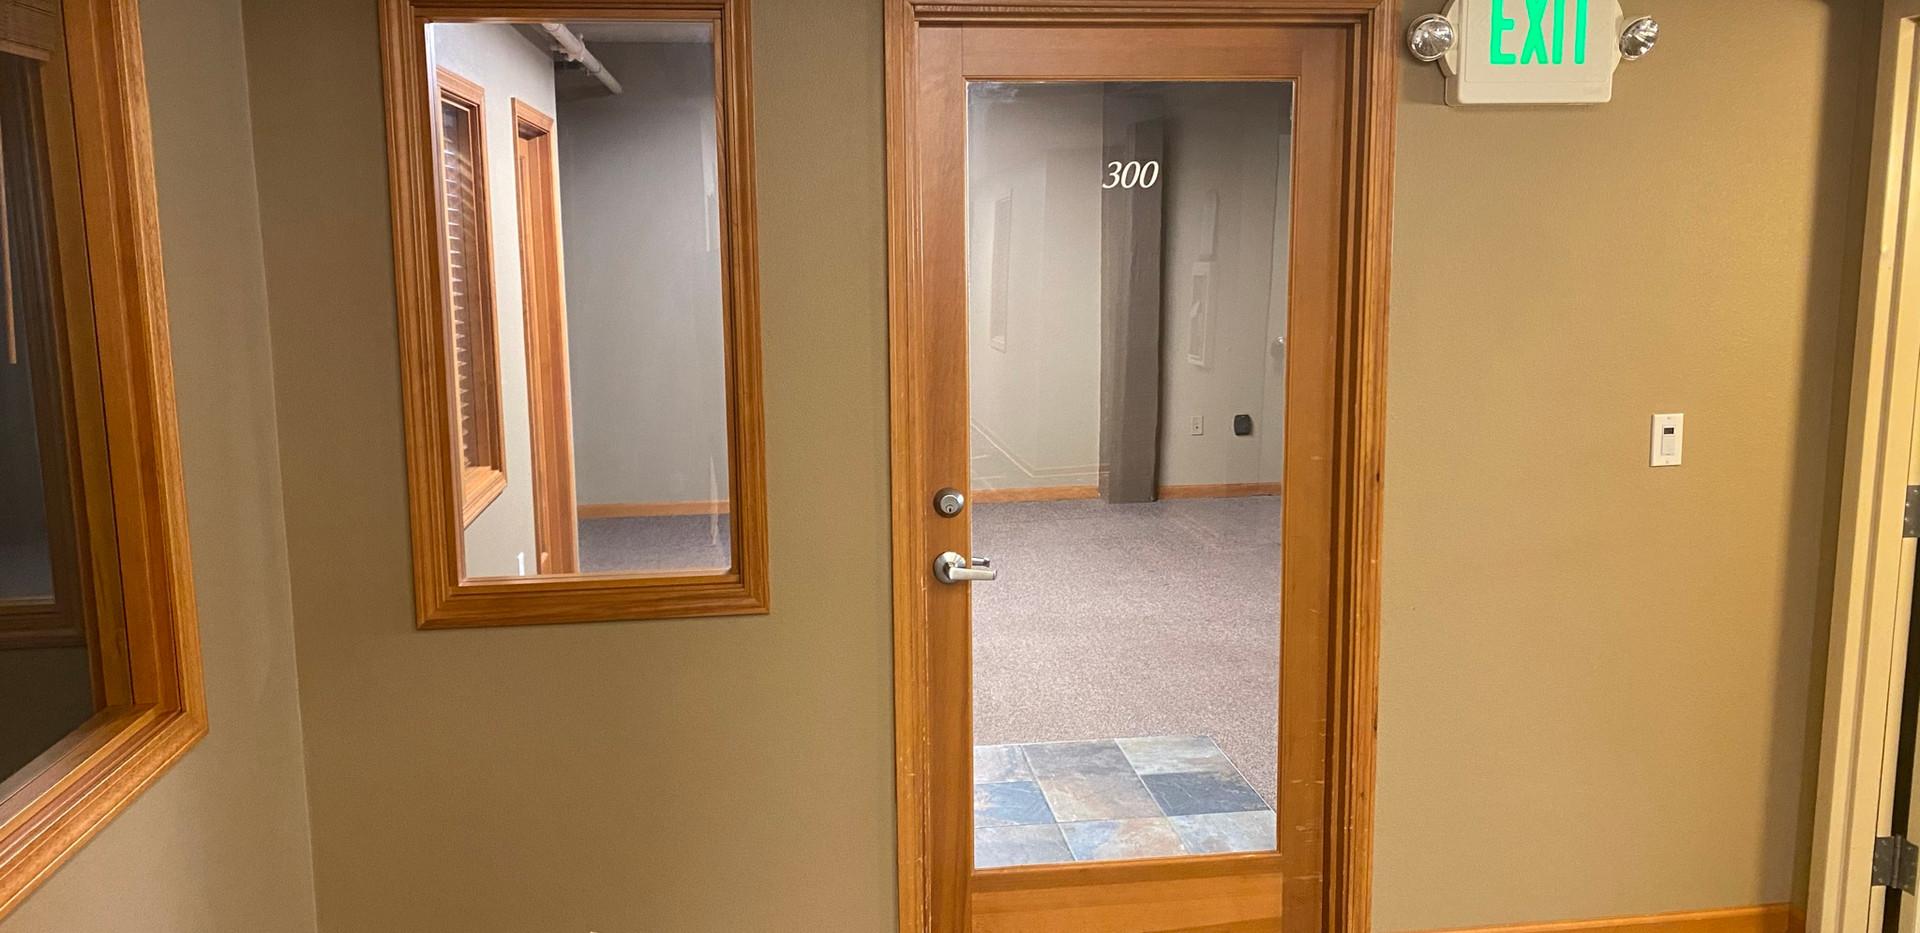 300 Hall Entrance